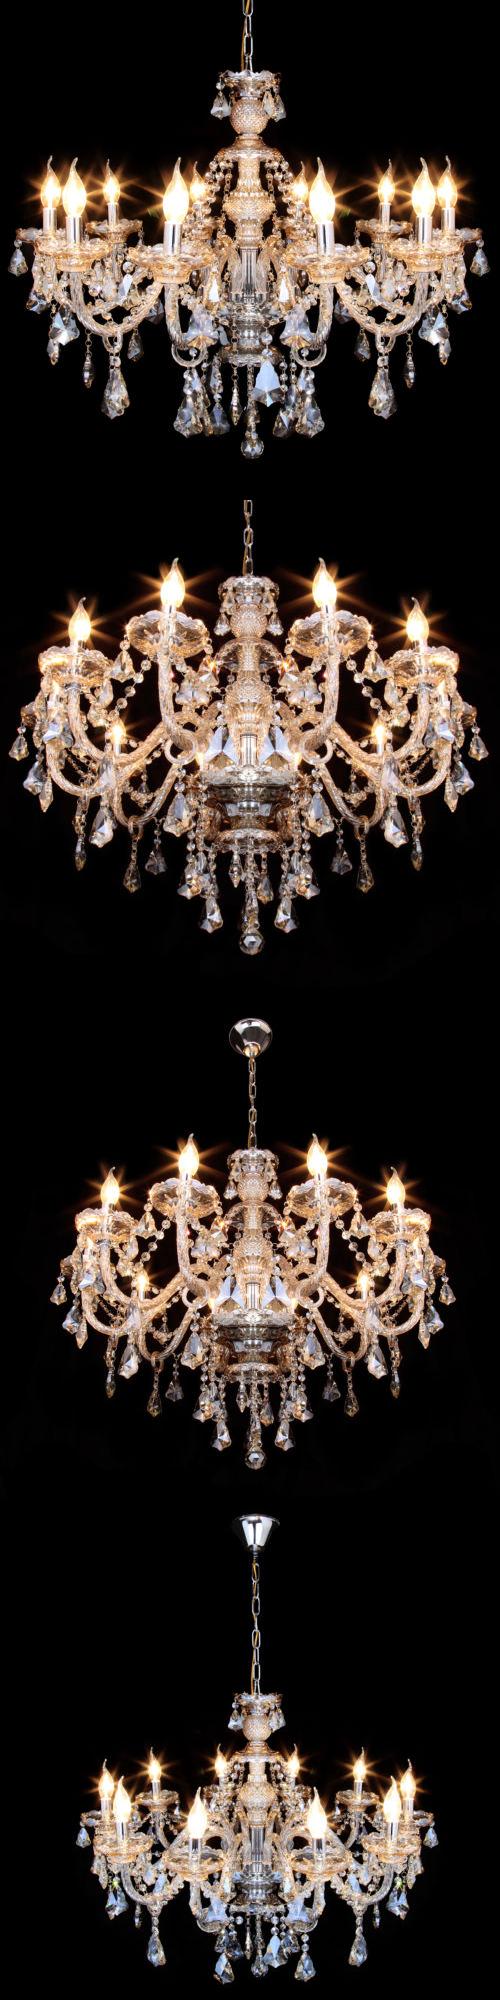 Lamps and lighting elegant modern ceiling light crystal chandelier